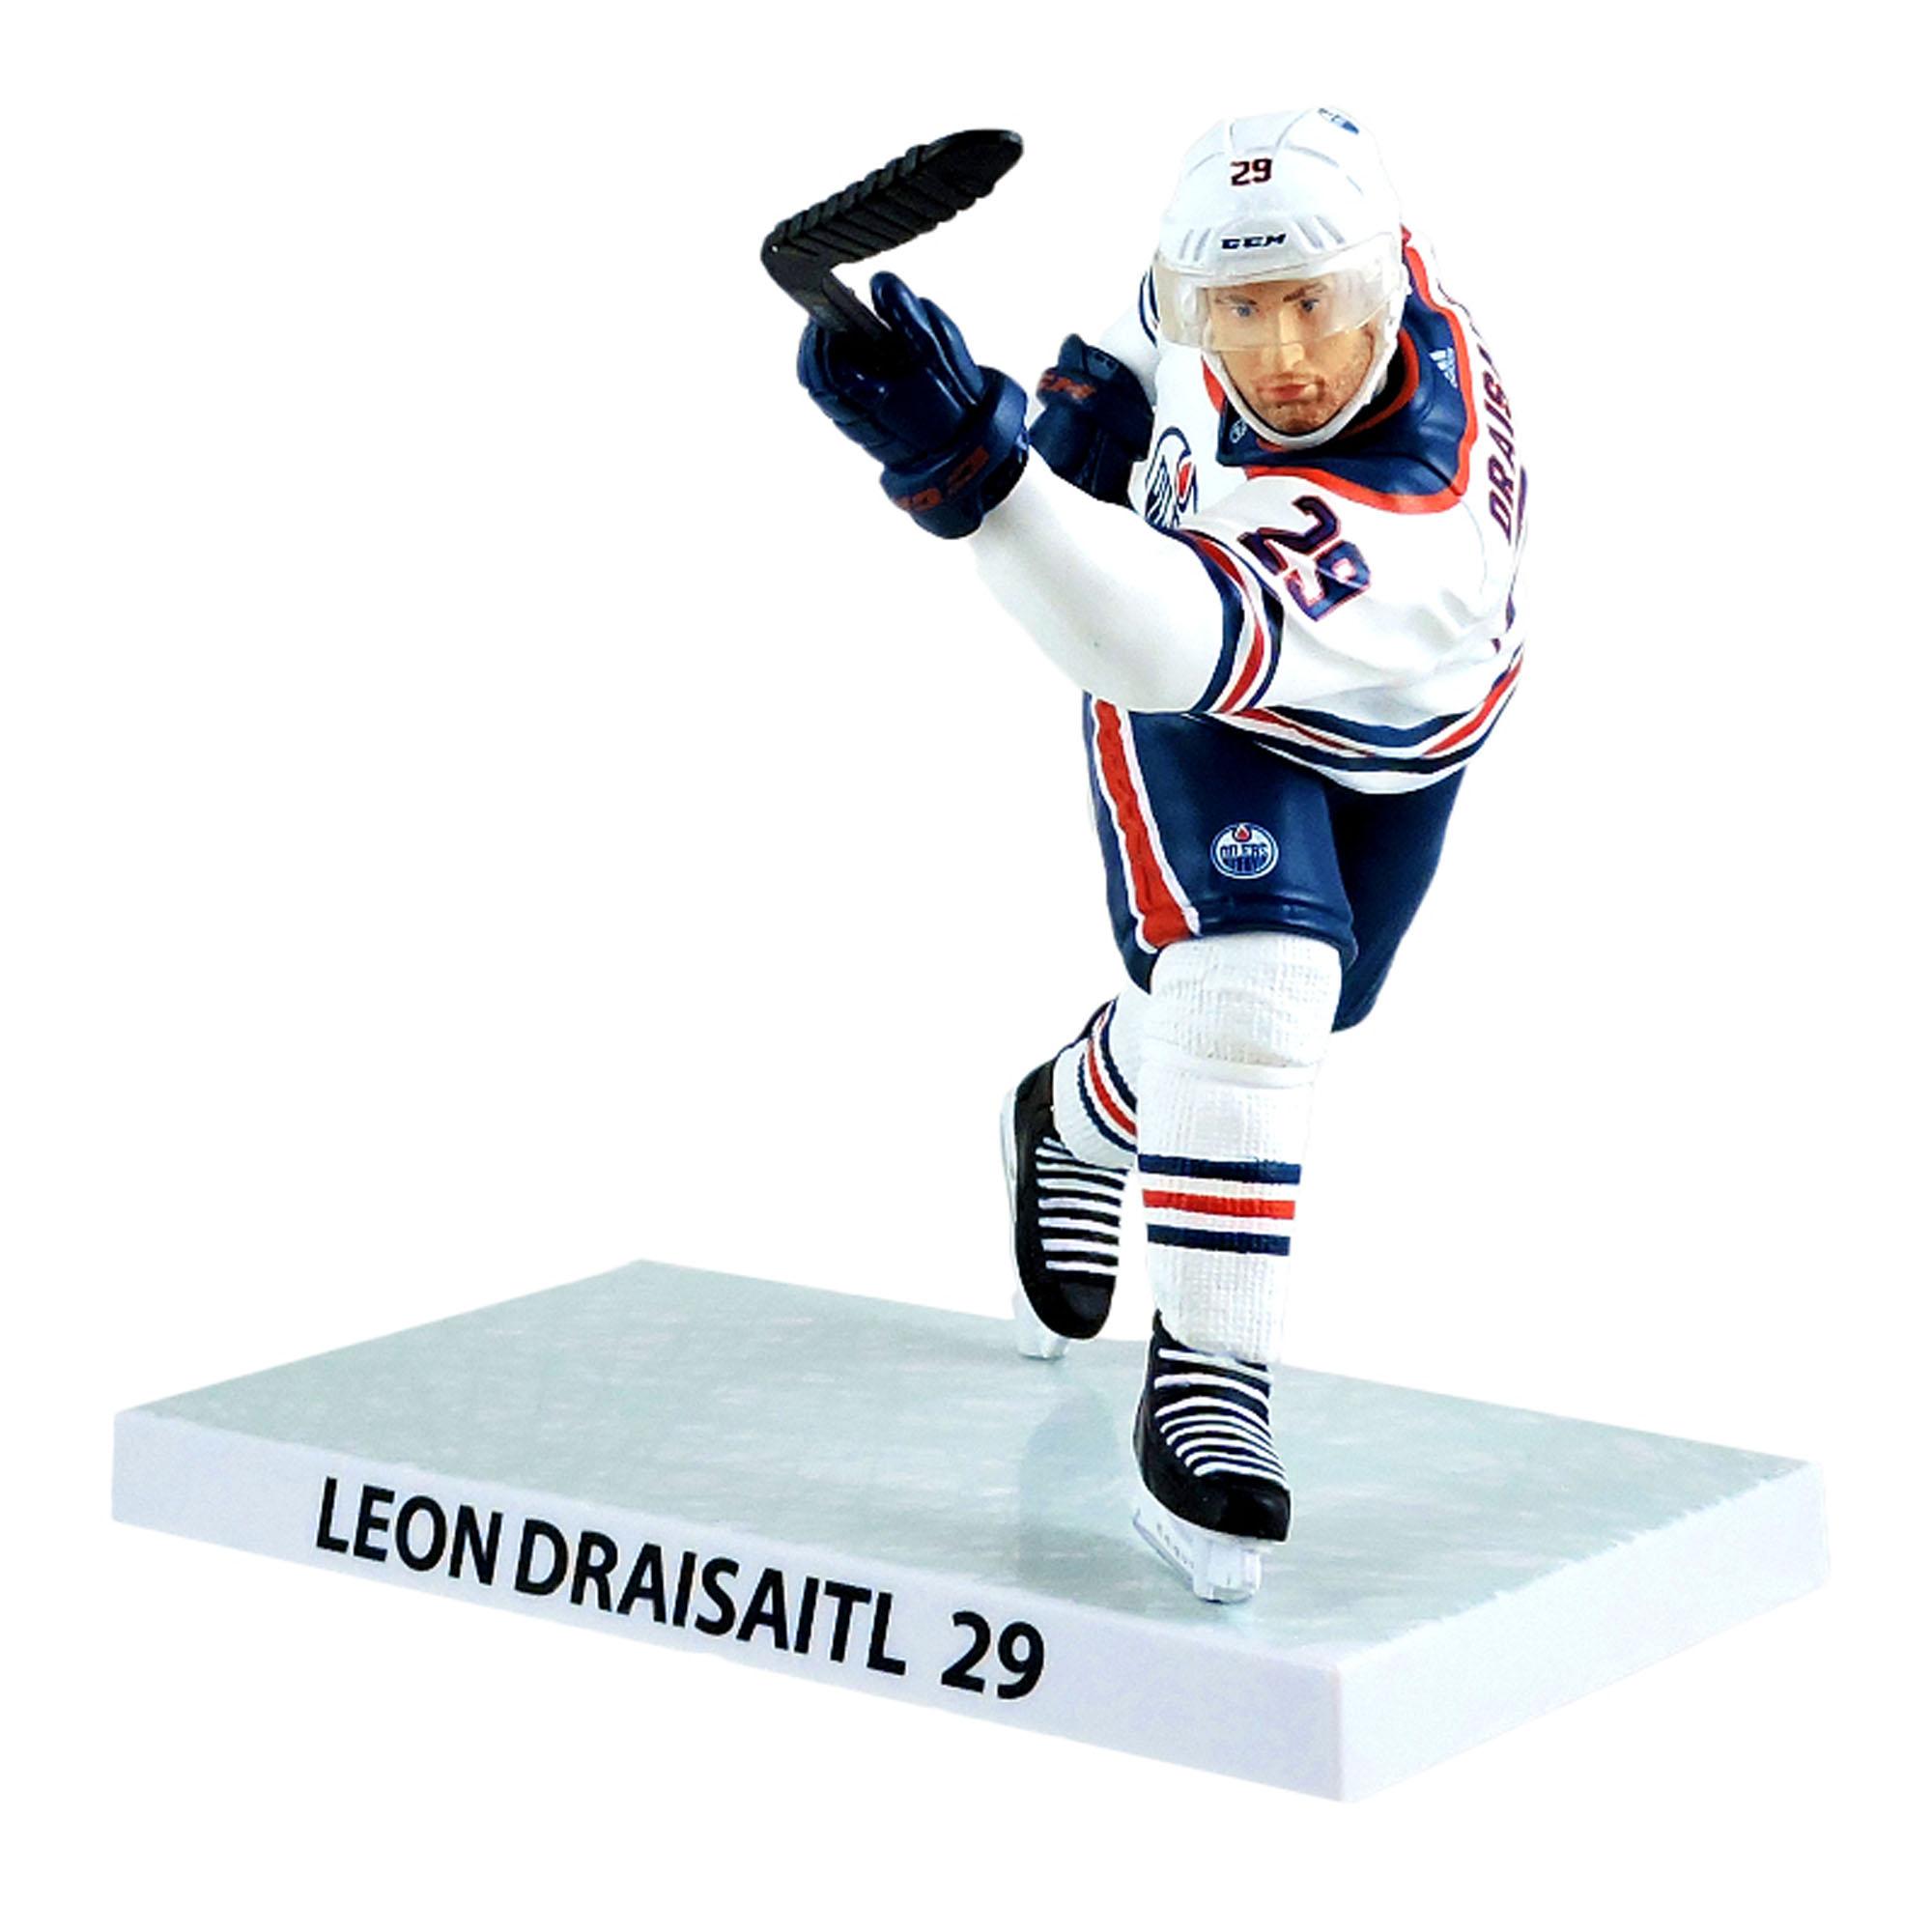 "Leon Draisaitl Edmonton Oilers Imports Dragon 6"" Player Replica Figurine - No Size"